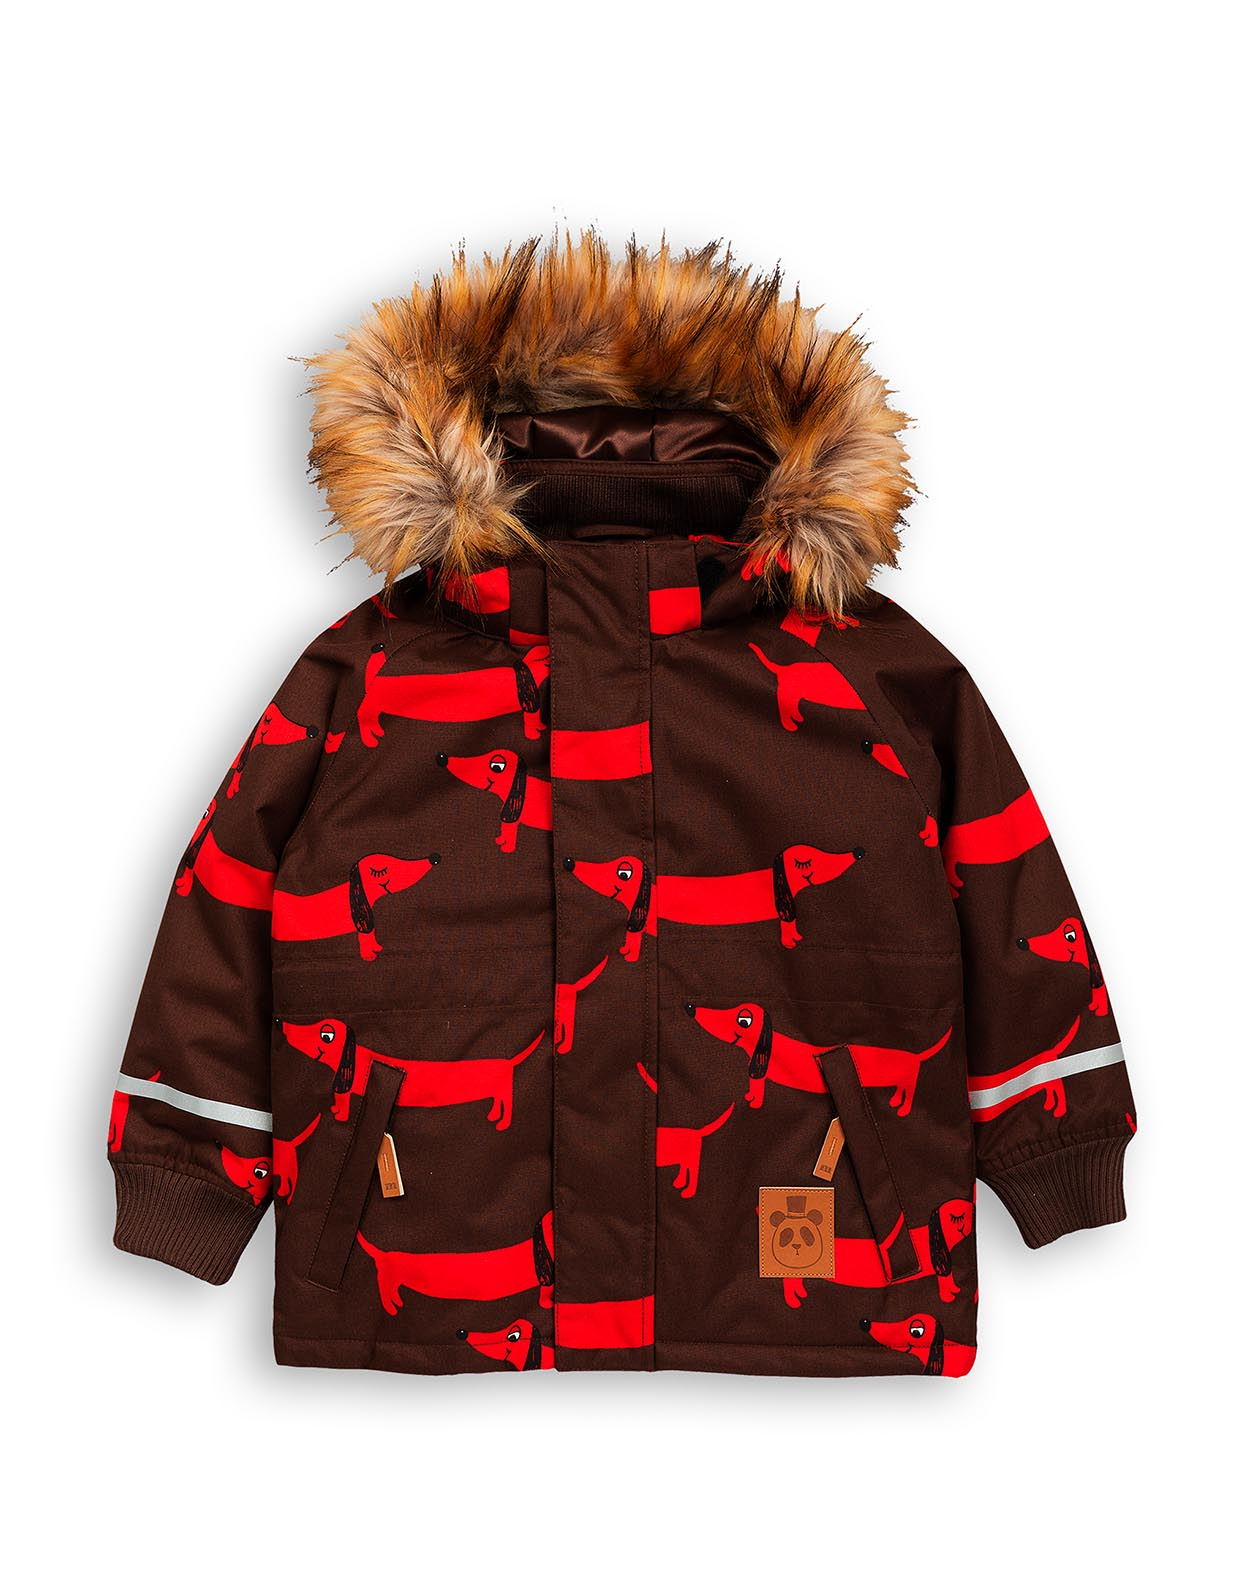 Mini Rodini coat